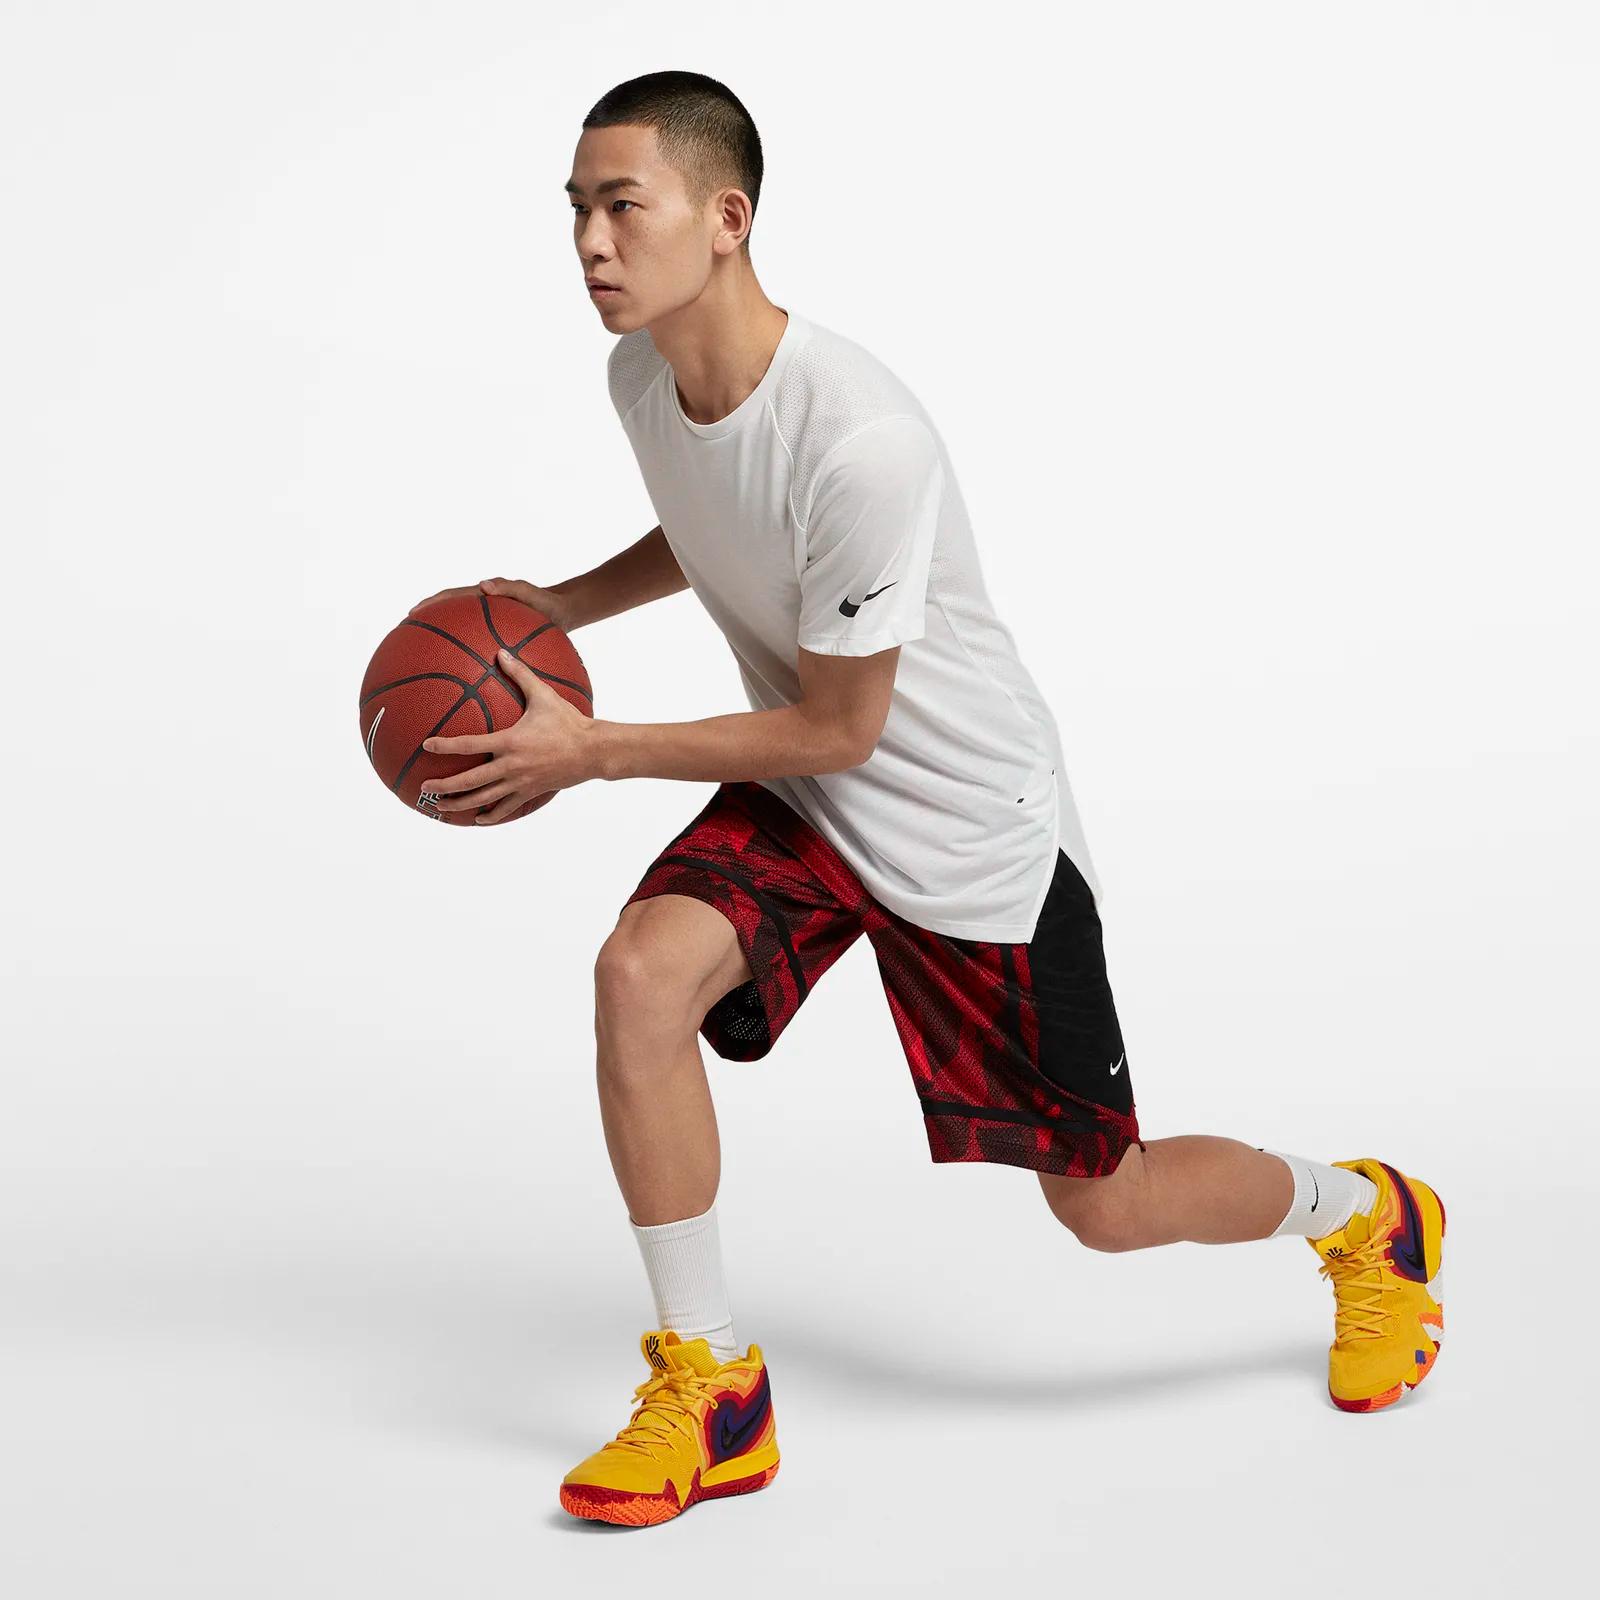 0dde0c71360 Nike Kyrie Dri-FIT Elite Basketball Shorts - SPORTING GOODS ...